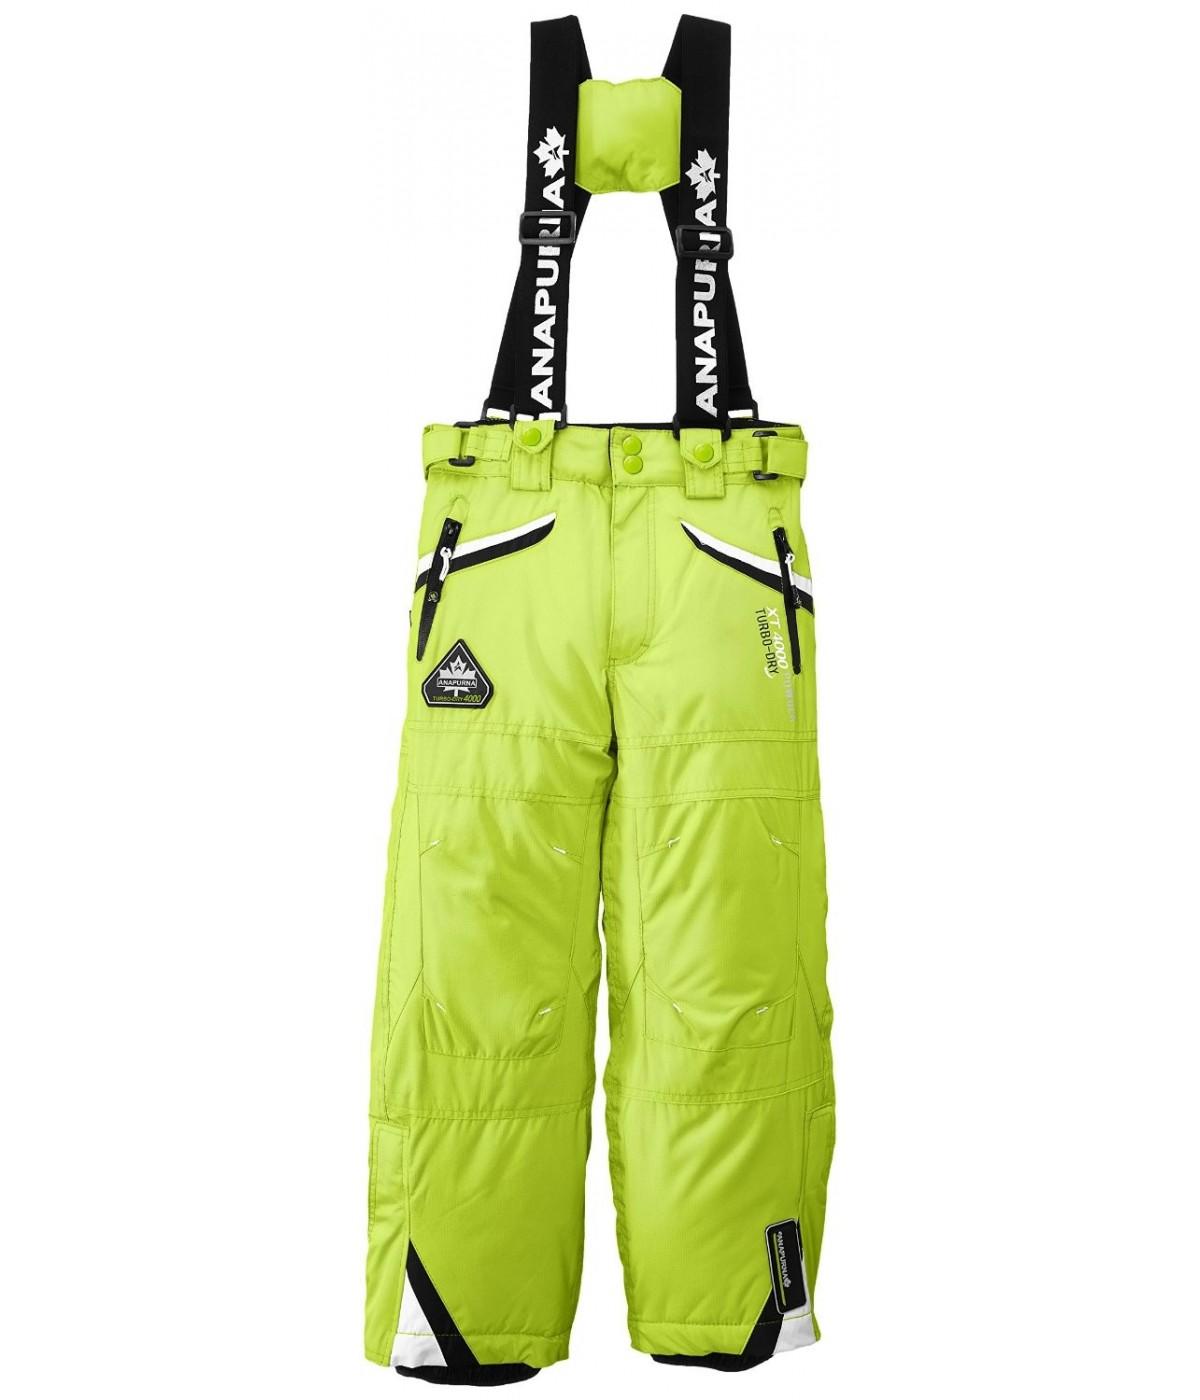 Enfant Garçon Pantalon Ski De Anapurna Woupy AnisShowroomvipPantalons NPk0OnX8wZ